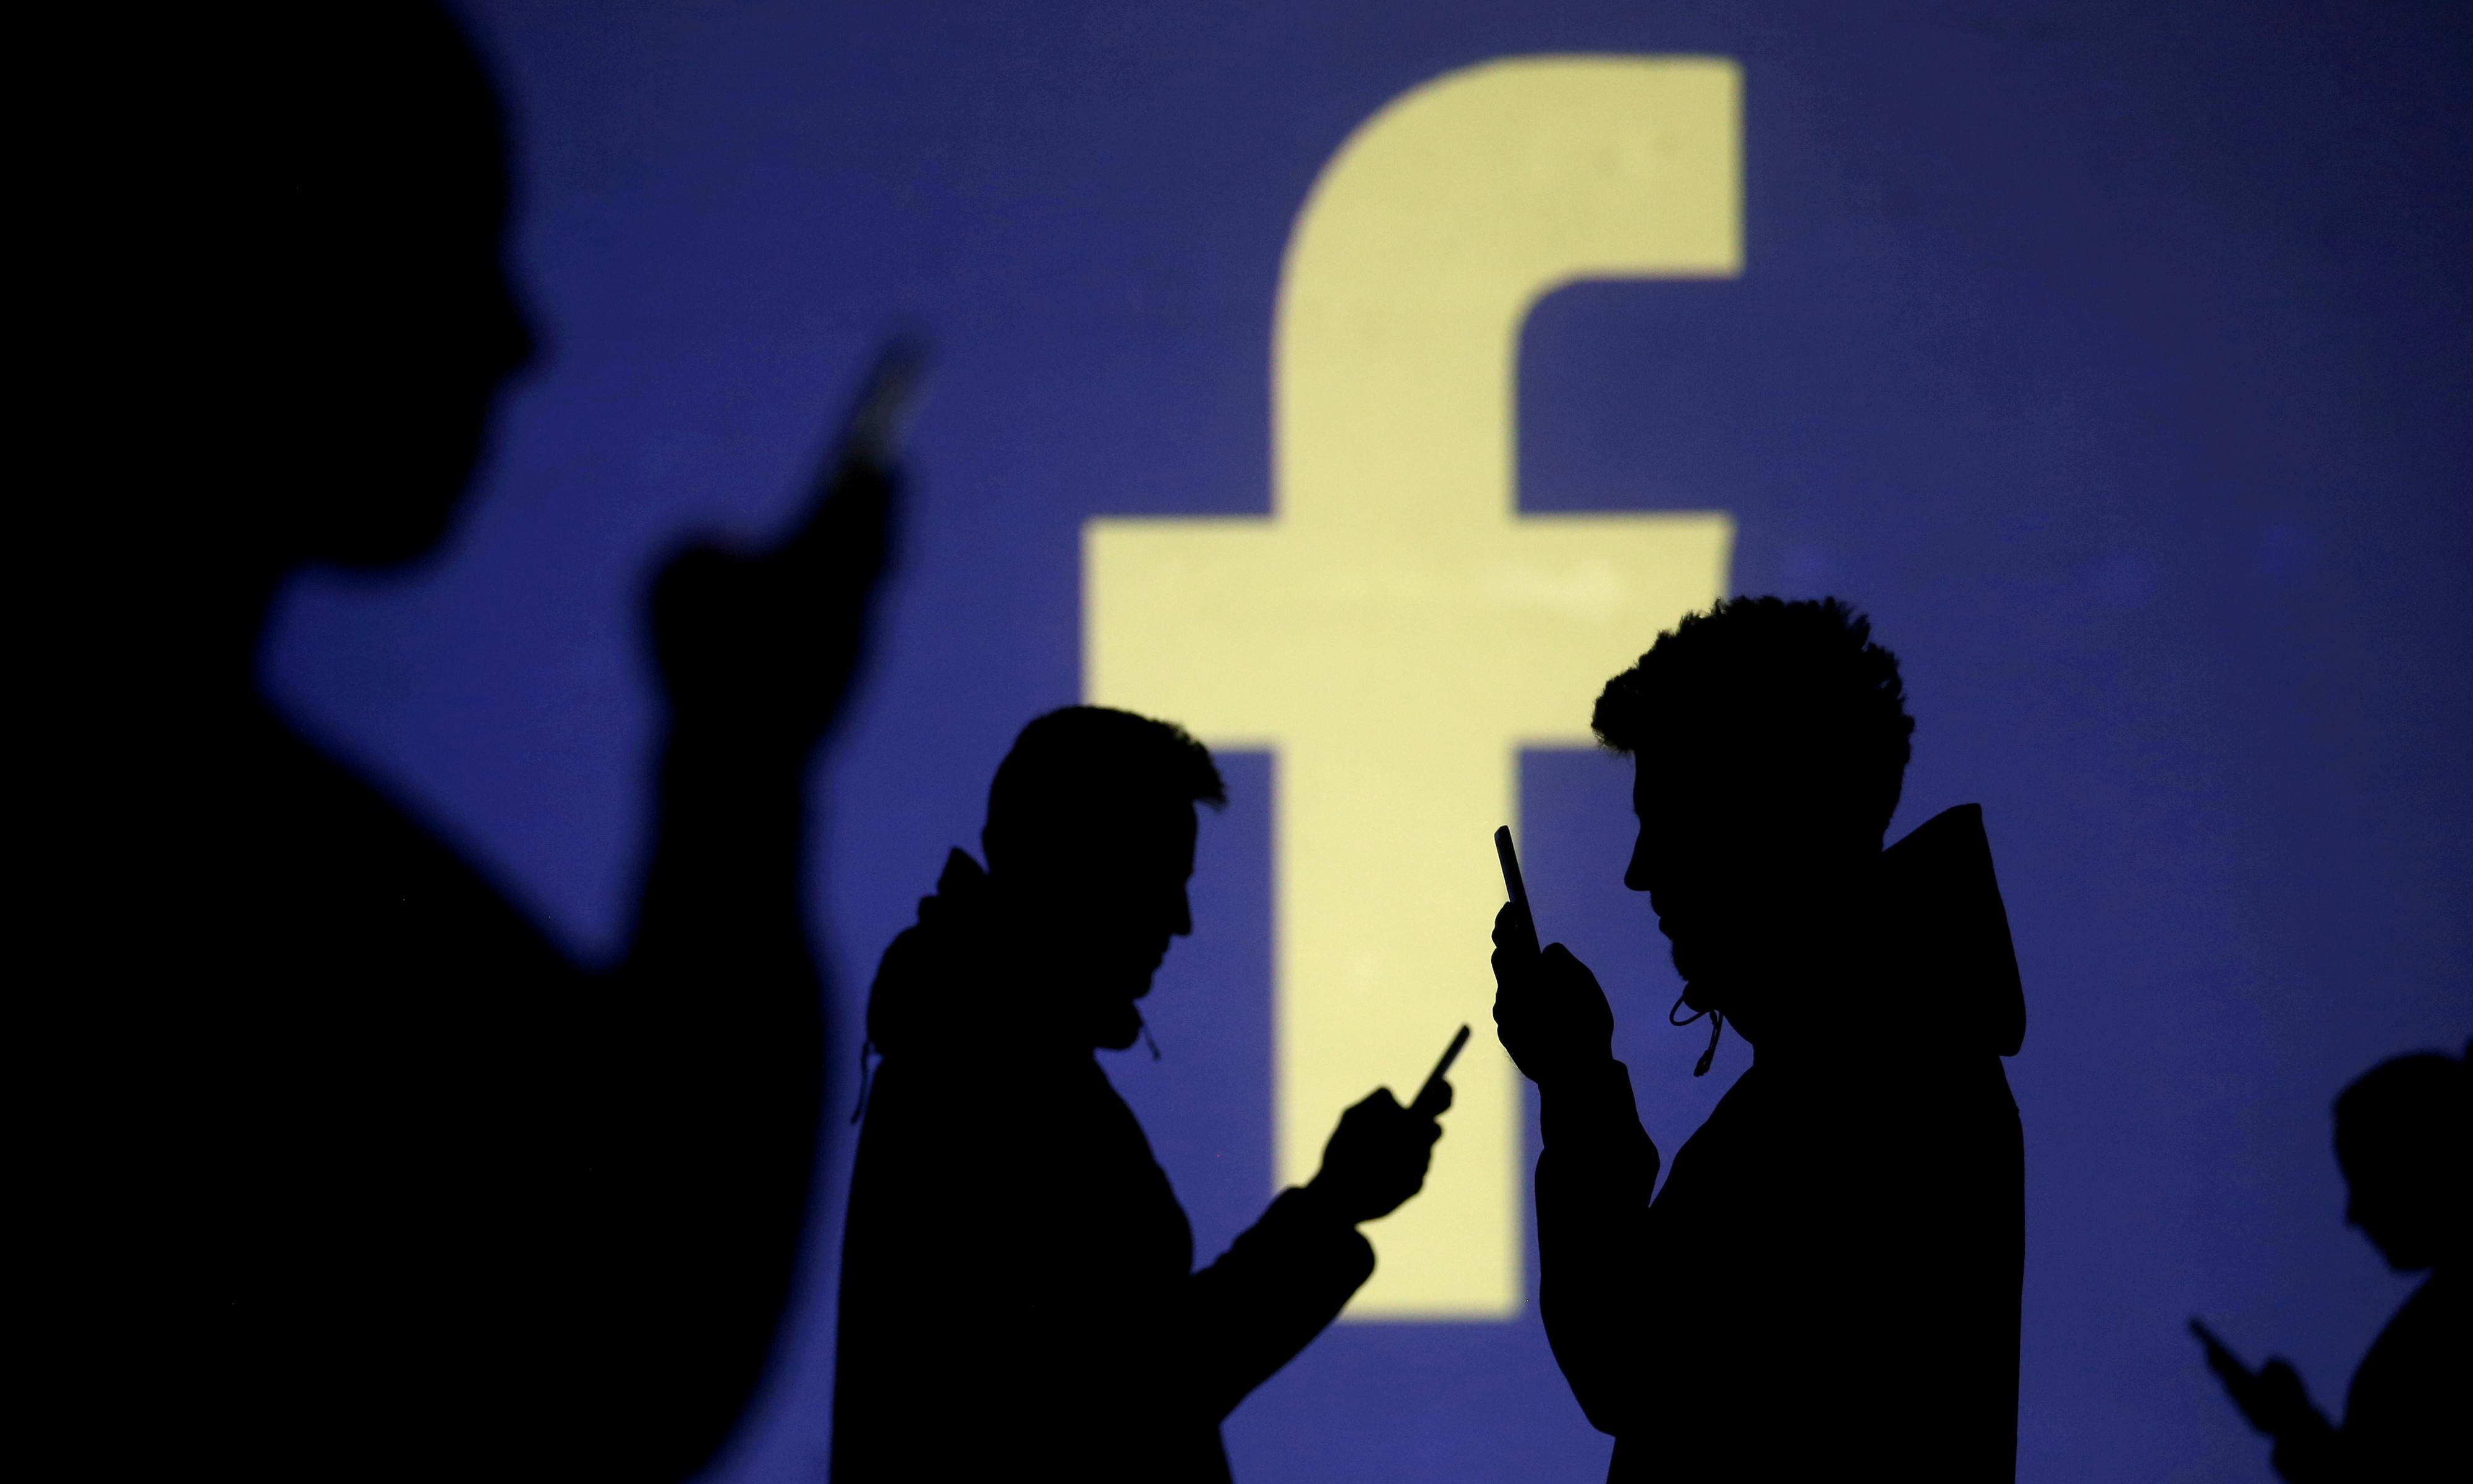 Parliamentary report set to savage 'duplicitous' Facebook